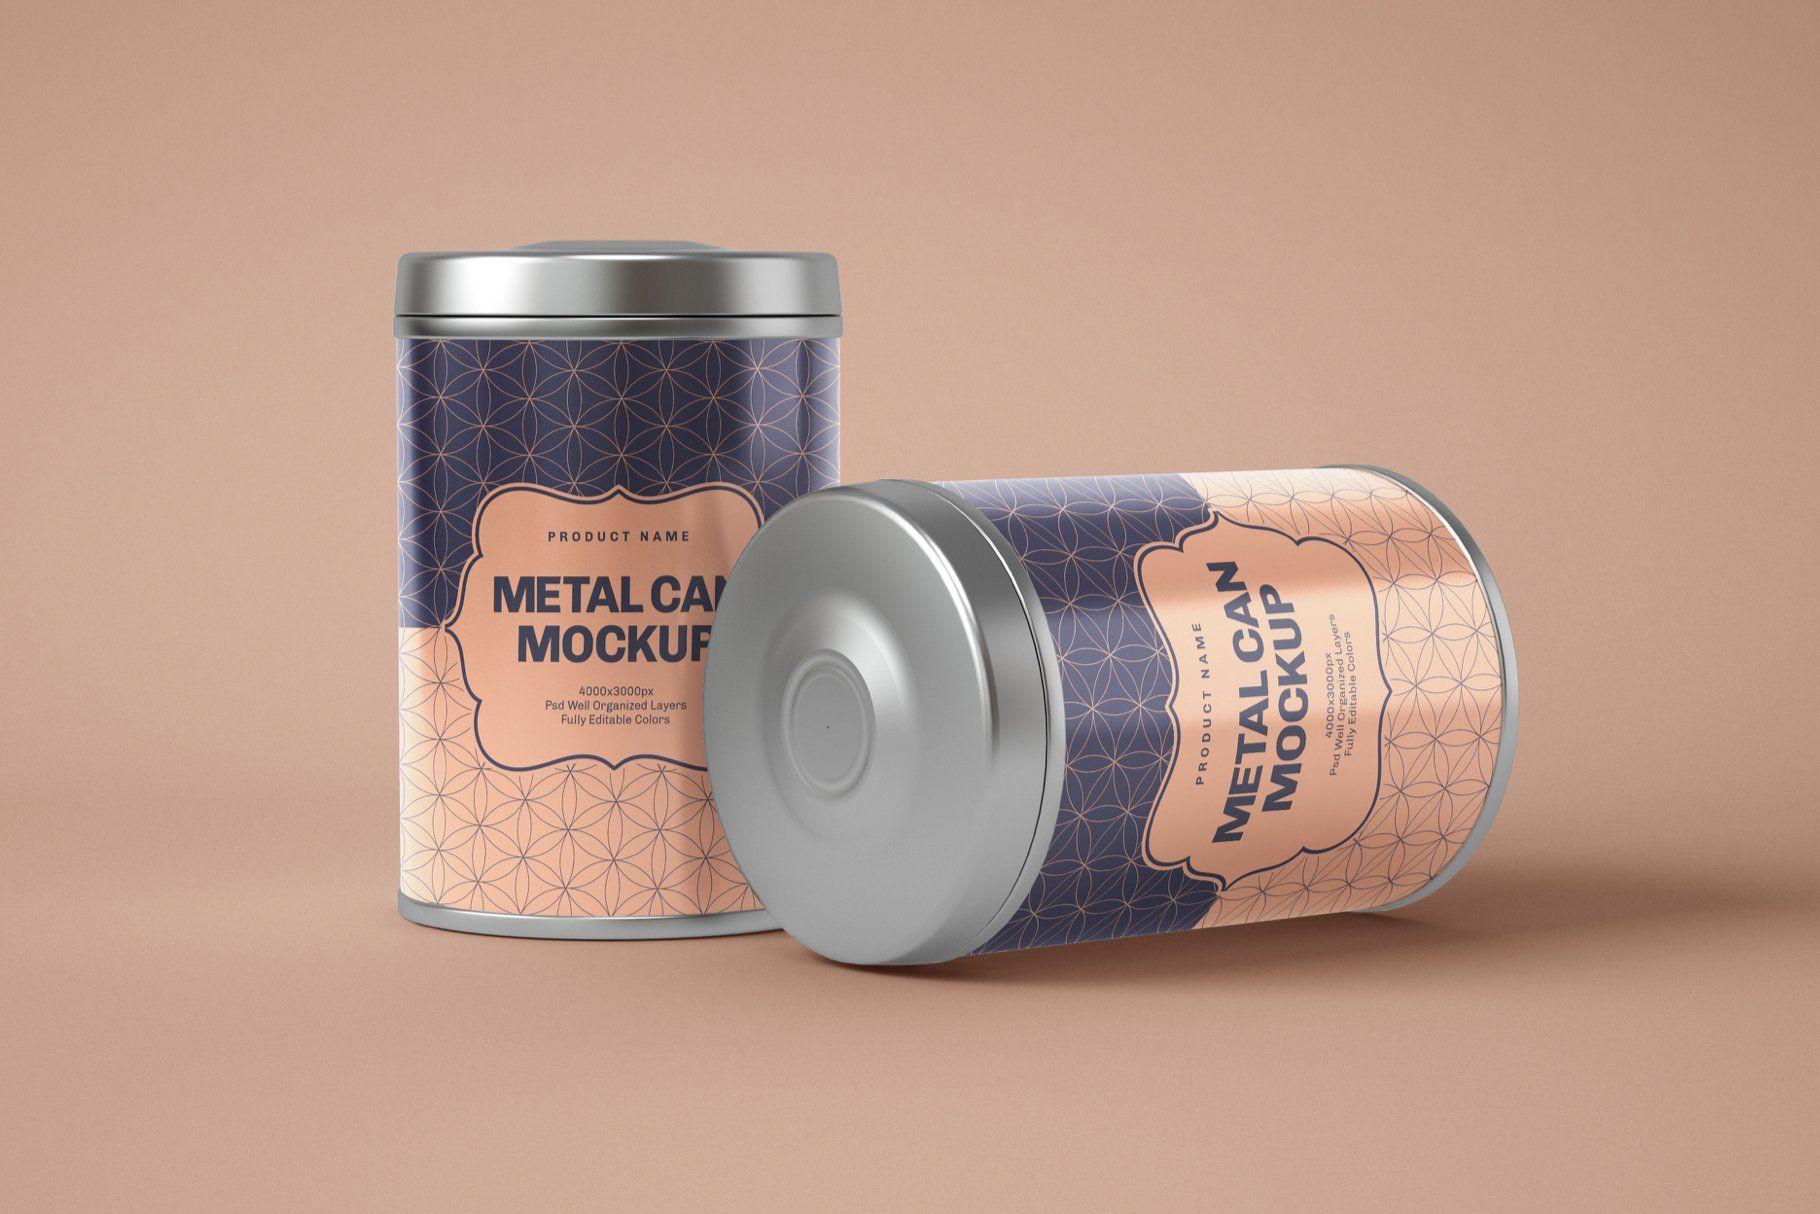 Download Glossy Metal Tin Can Box Mockup Set In 2020 Box Mockup Metal Tins Box Packaging Design PSD Mockup Templates